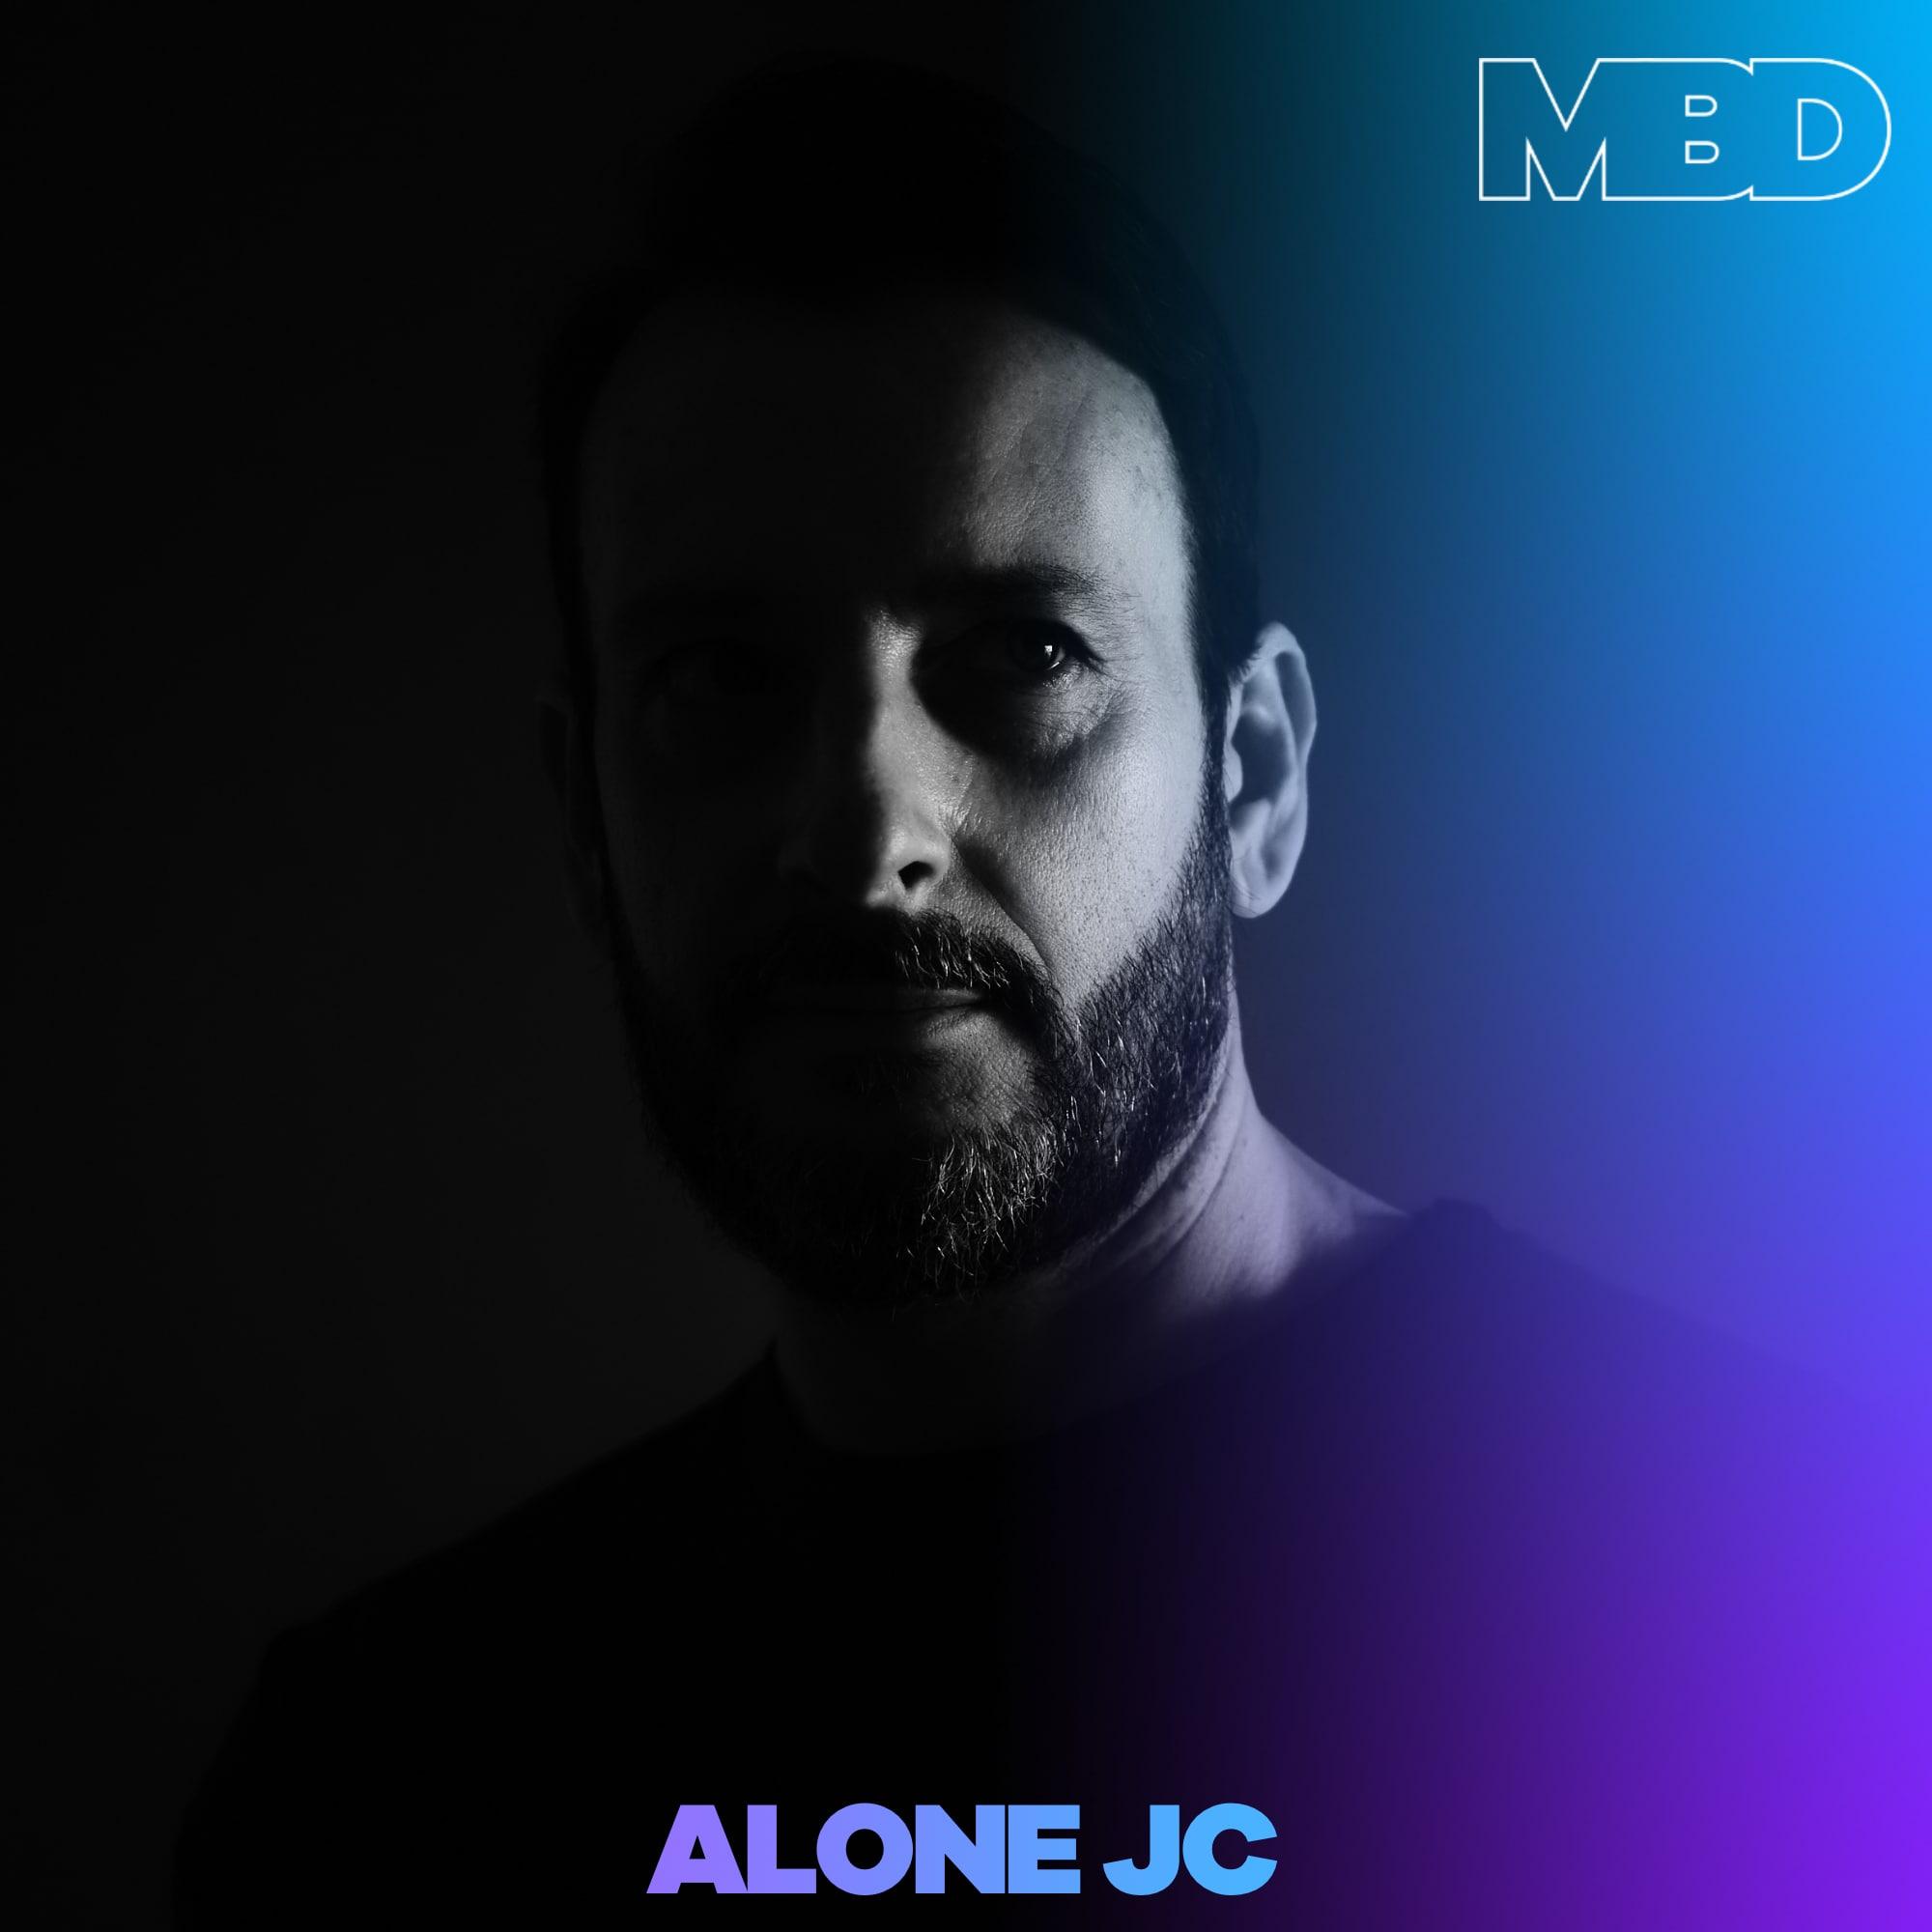 Alone JC